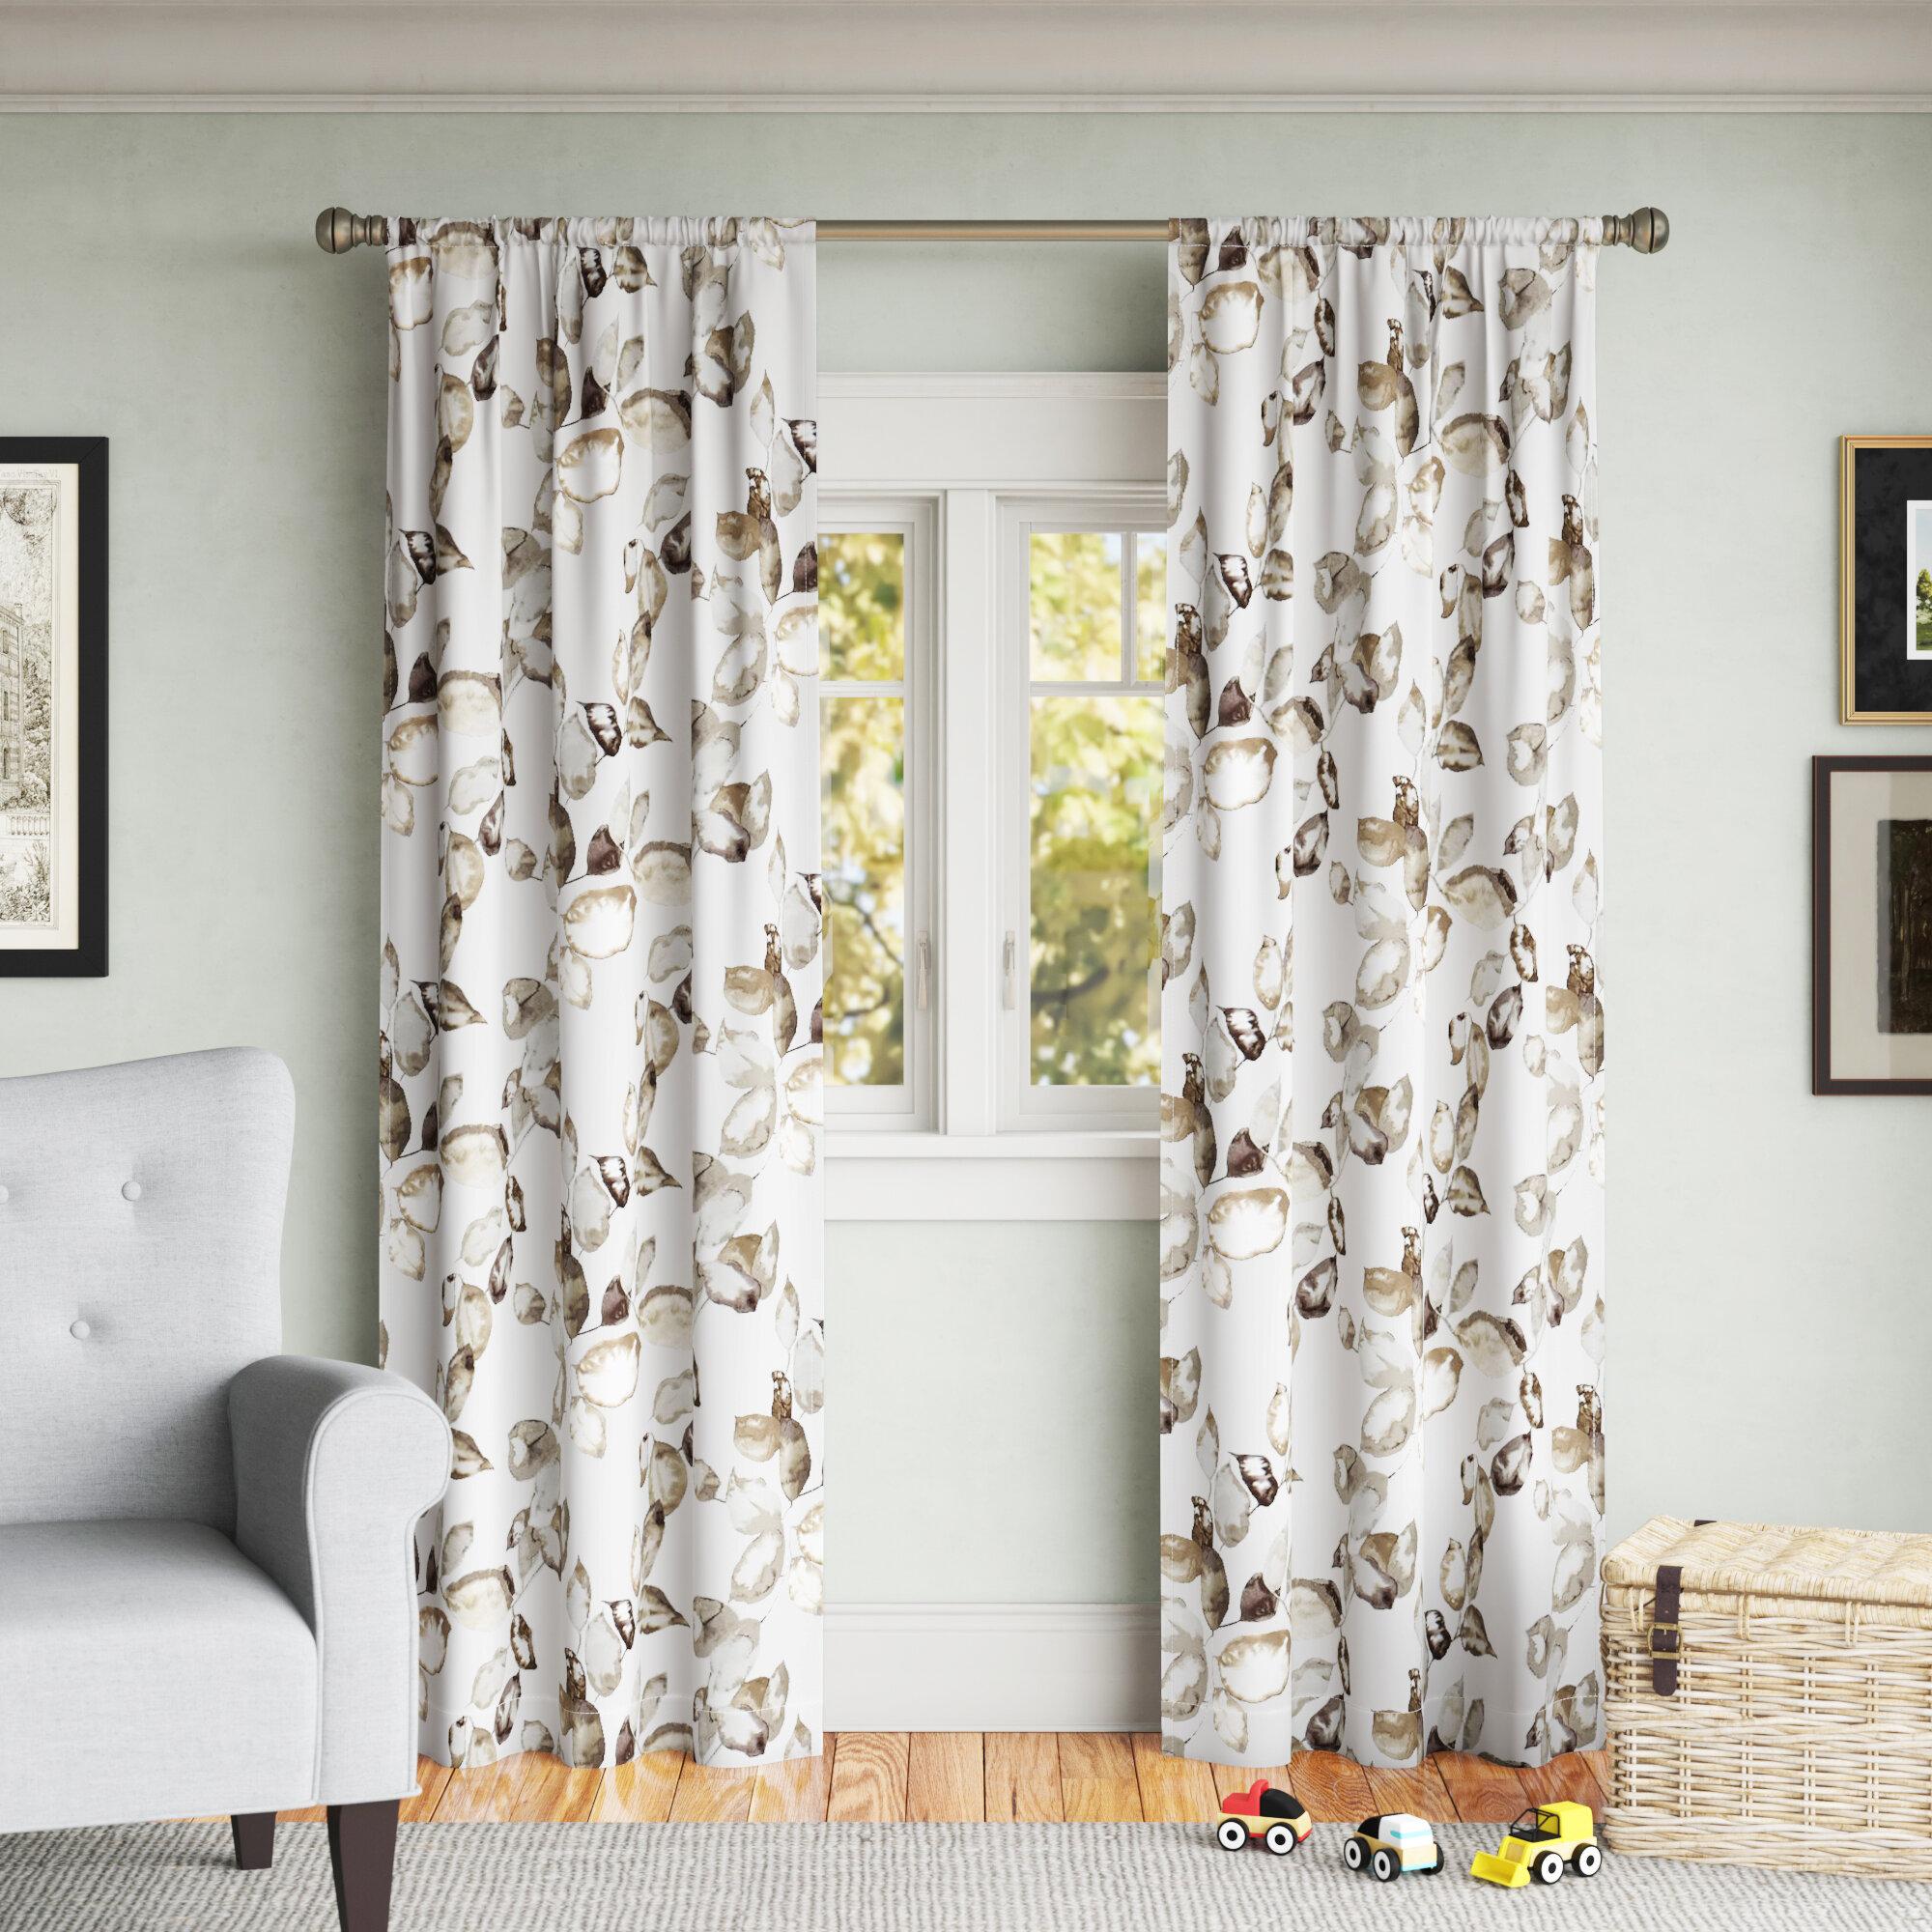 Andover Mills Richas Floral Room Darkening Thermal Rod Pocket Single Curtain Panel Reviews Wayfair